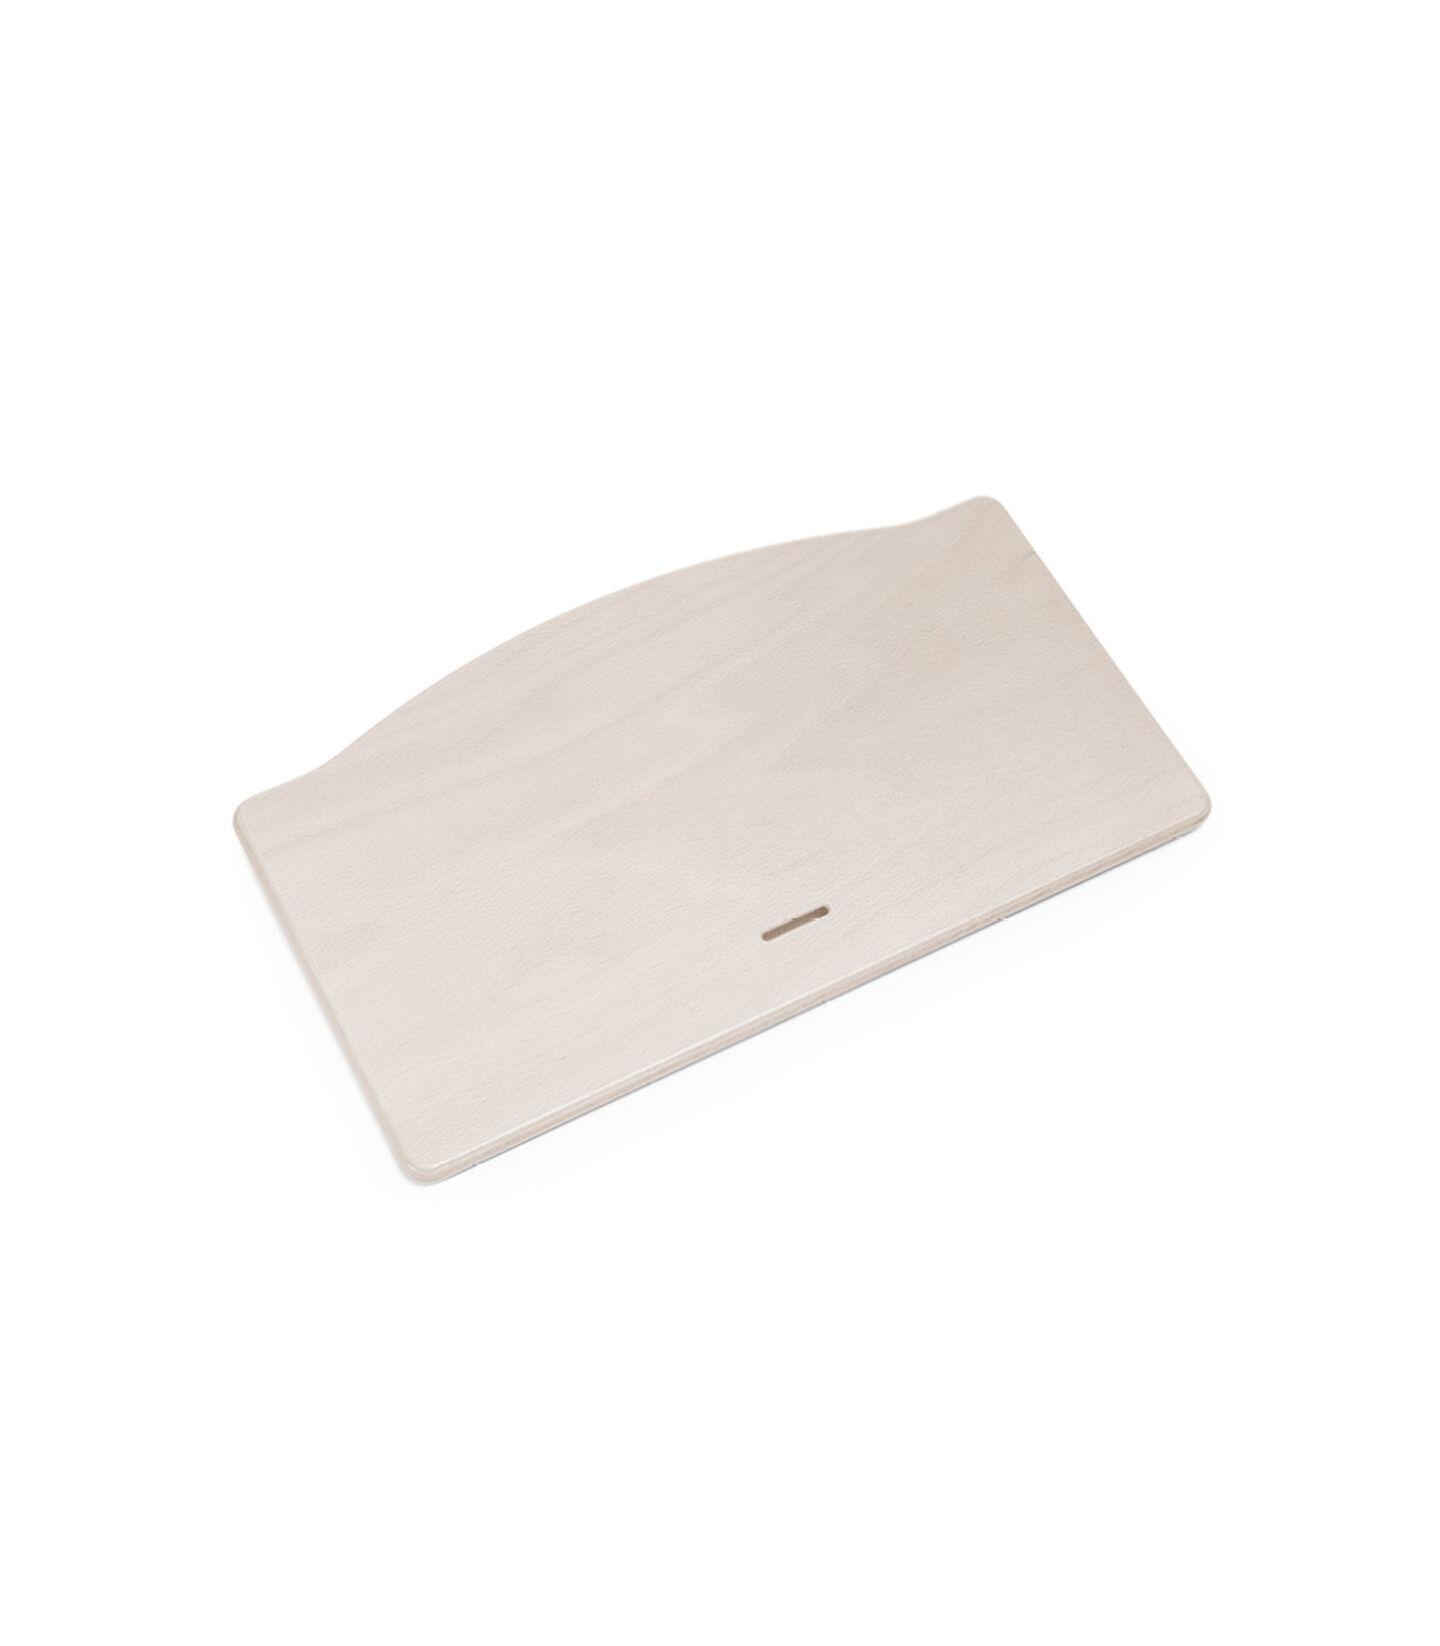 108805 Tripp Trapp Seat plate Whitewash (Spare part). view 1